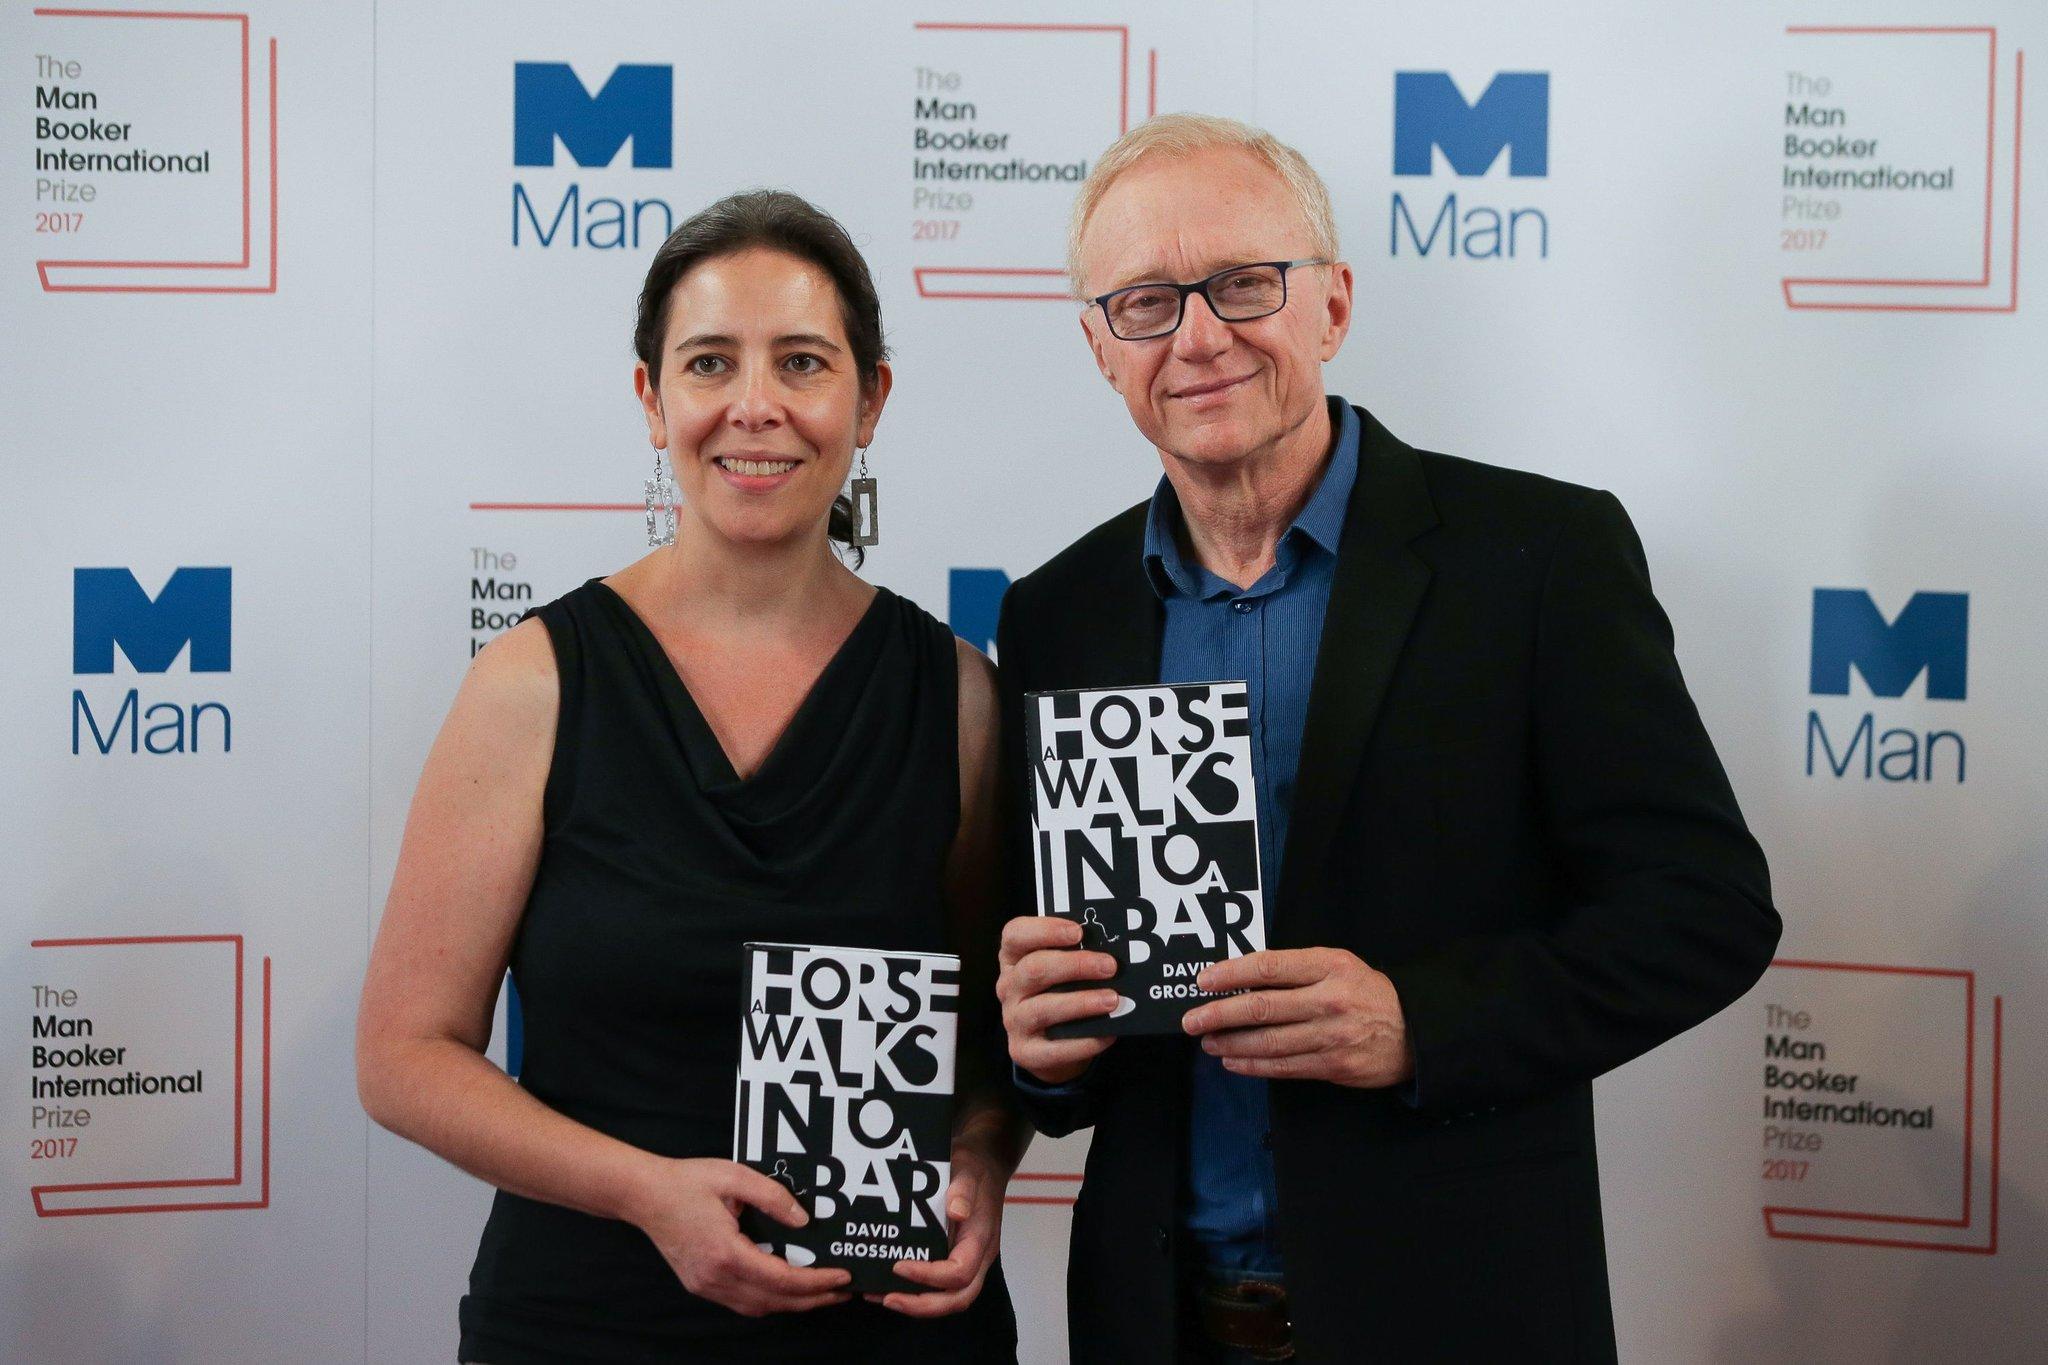 Jessica Cohen and David Grossman